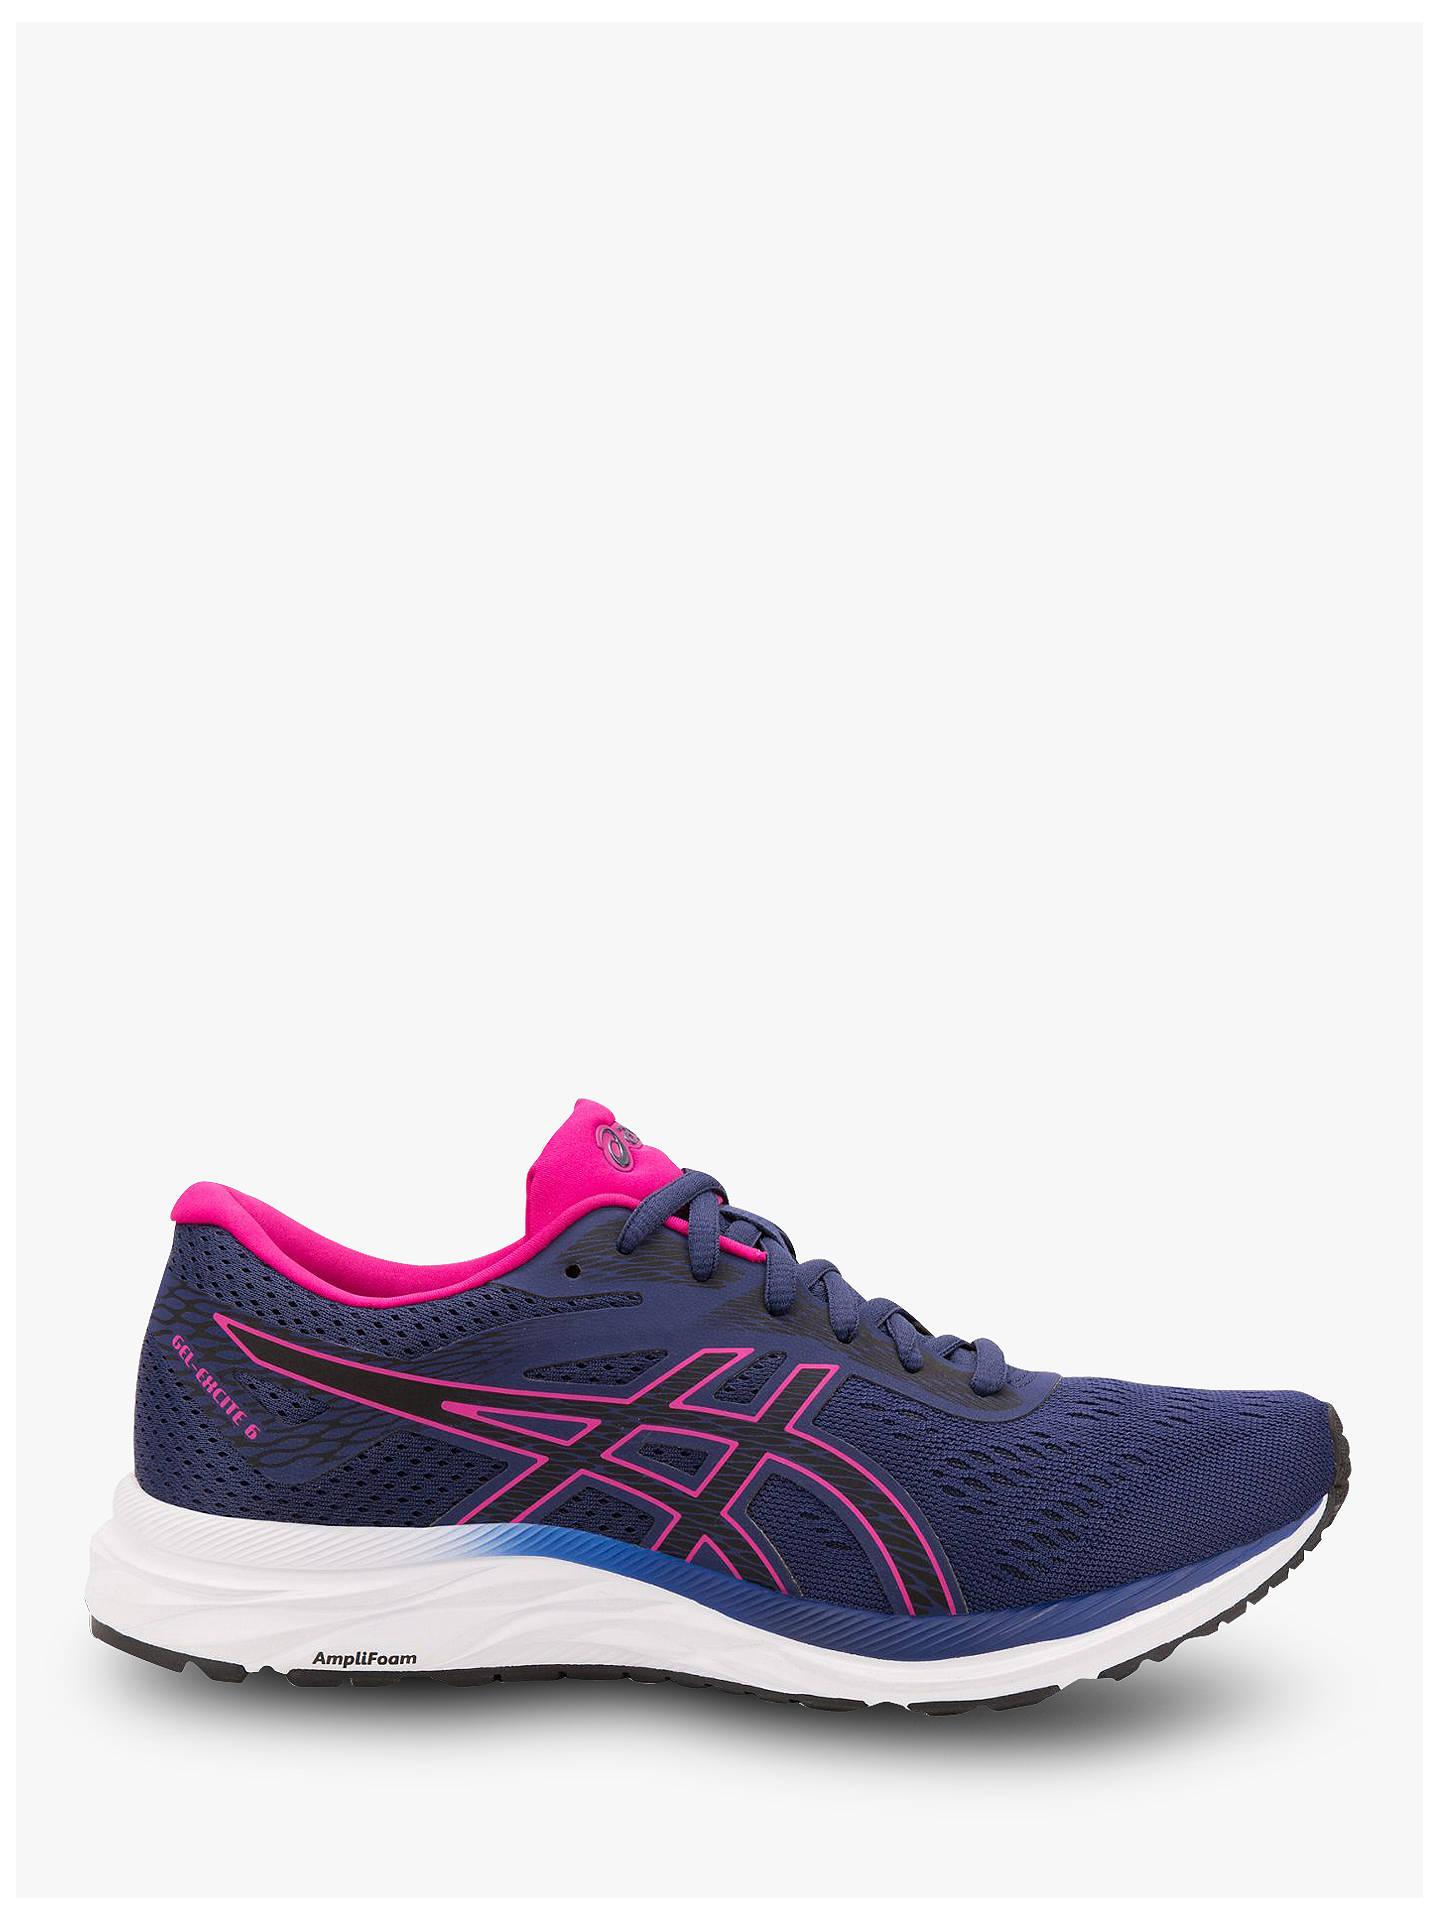 52d77d3e57ea48 Buy ASICS GEL-EXCITE 6 Women's Running Shoes, Indigo Blue/Pink Rave, ...